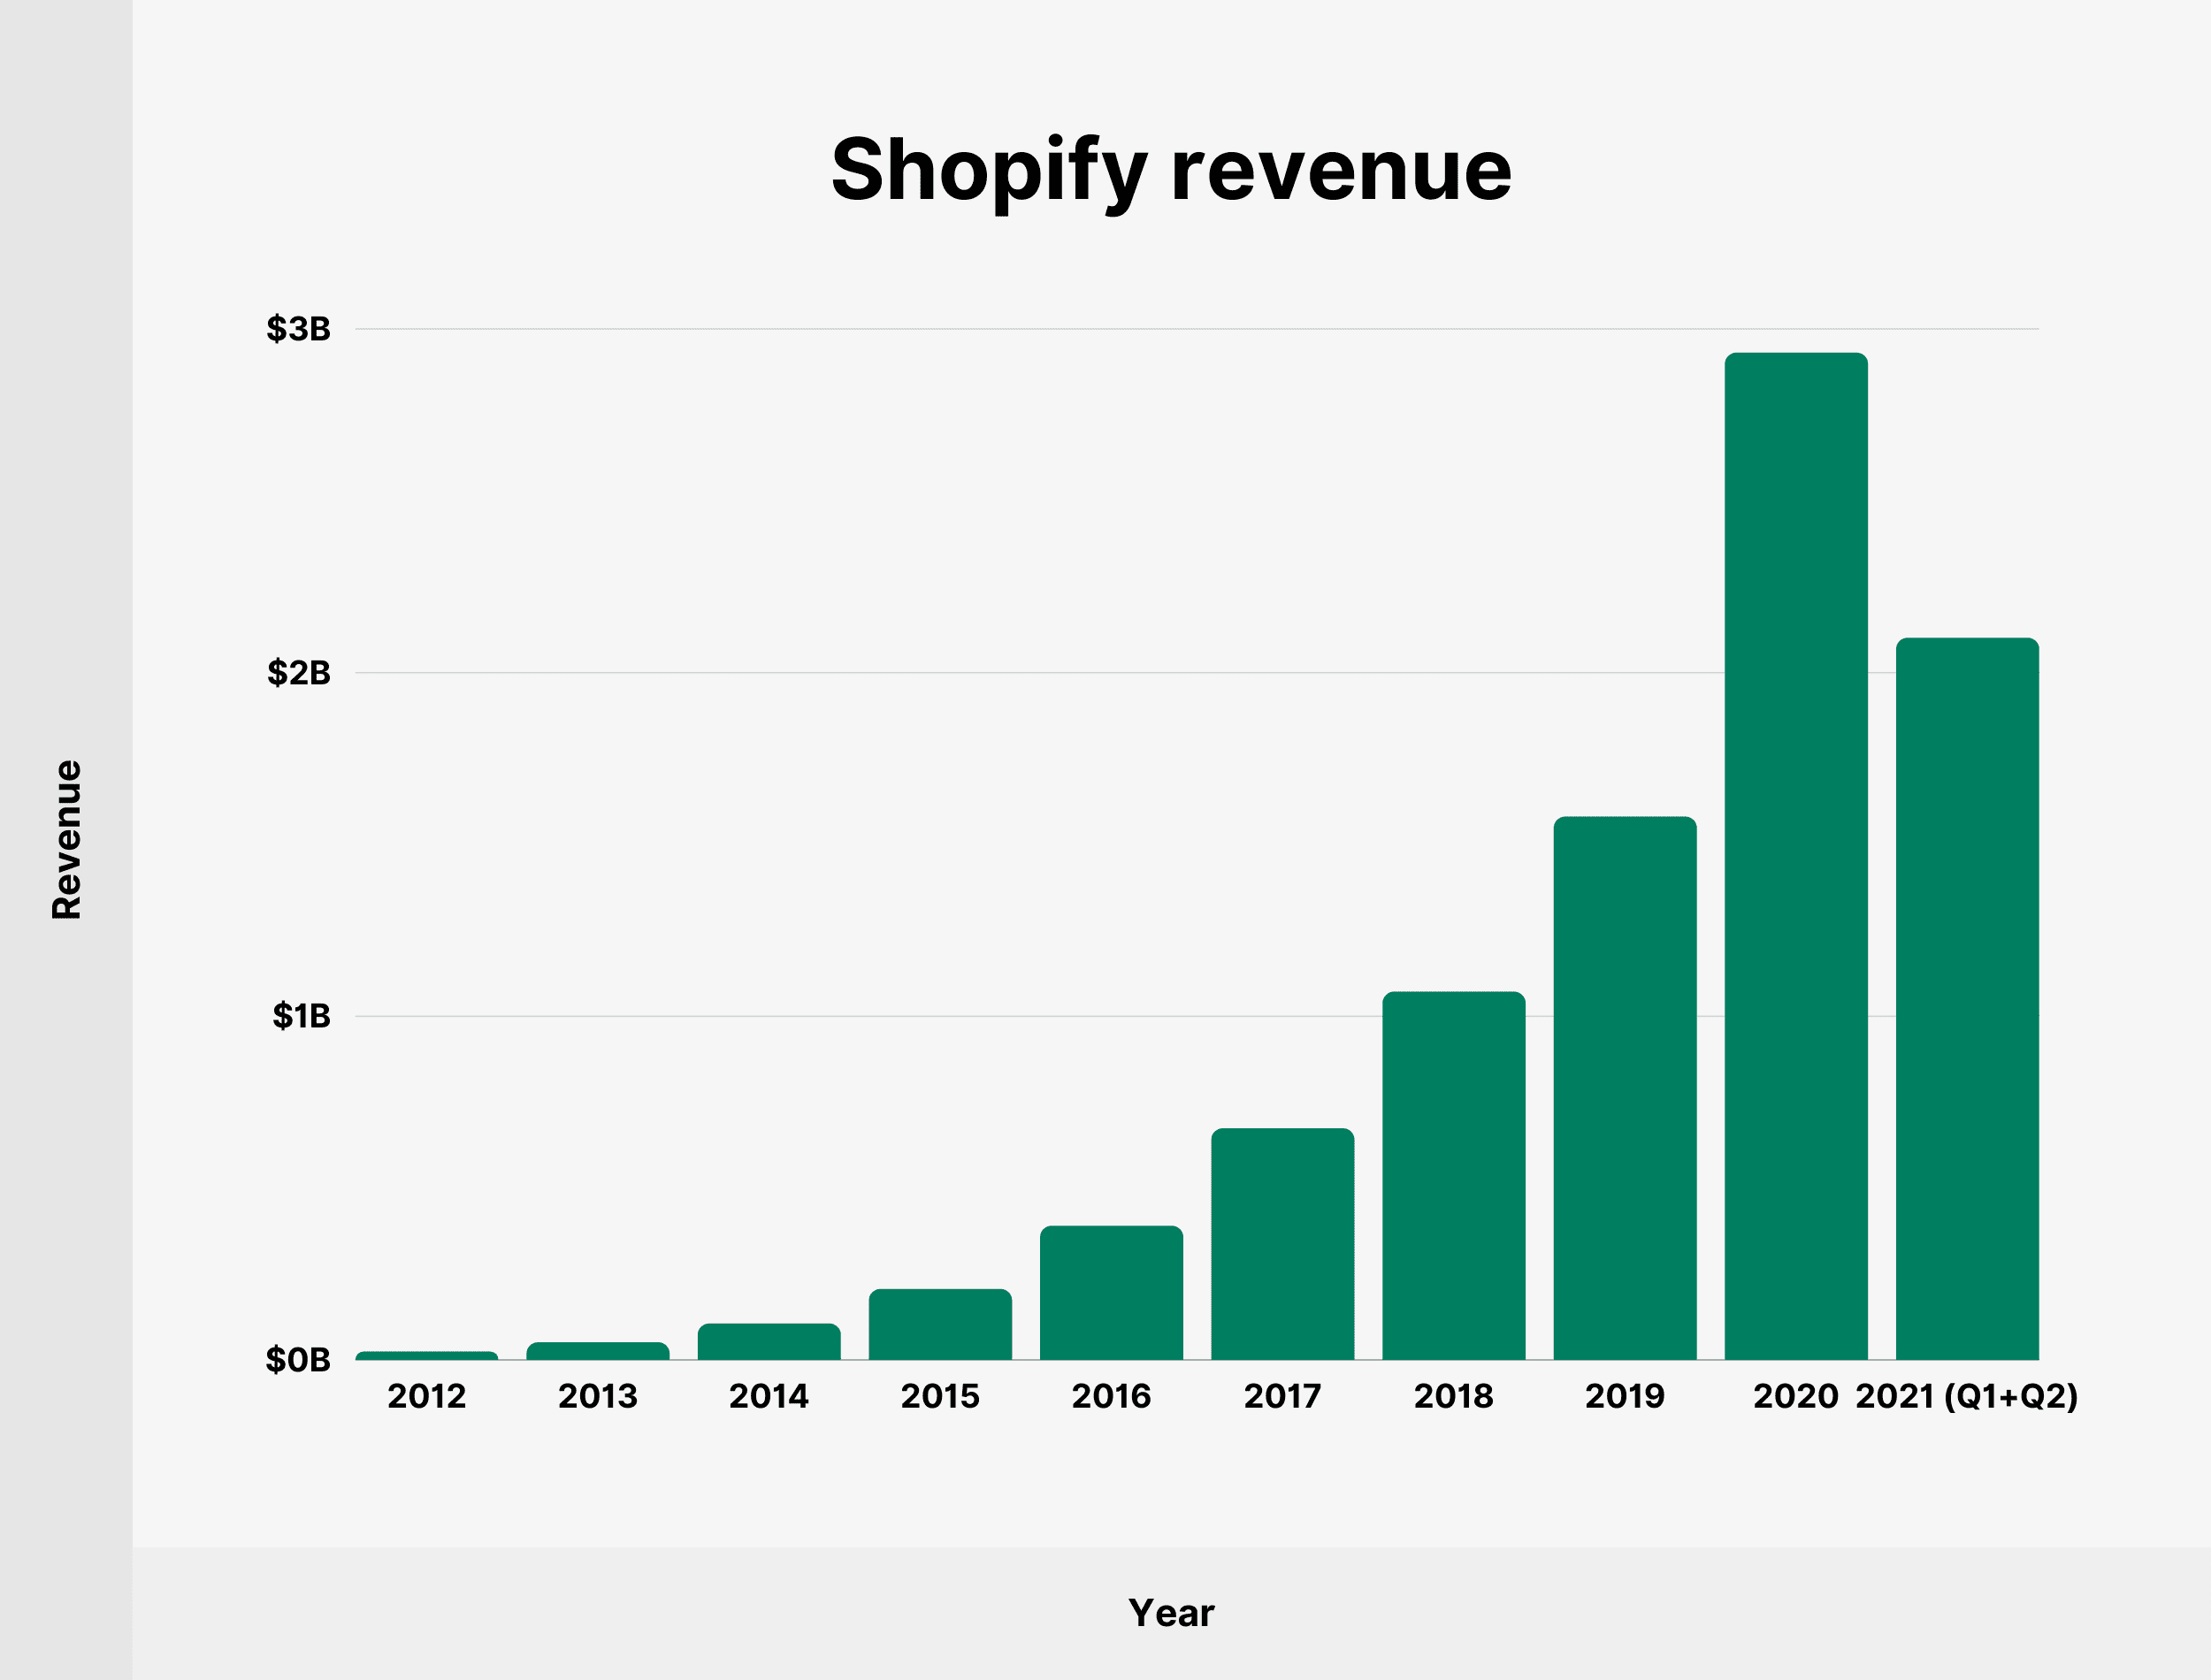 Shopify revenue